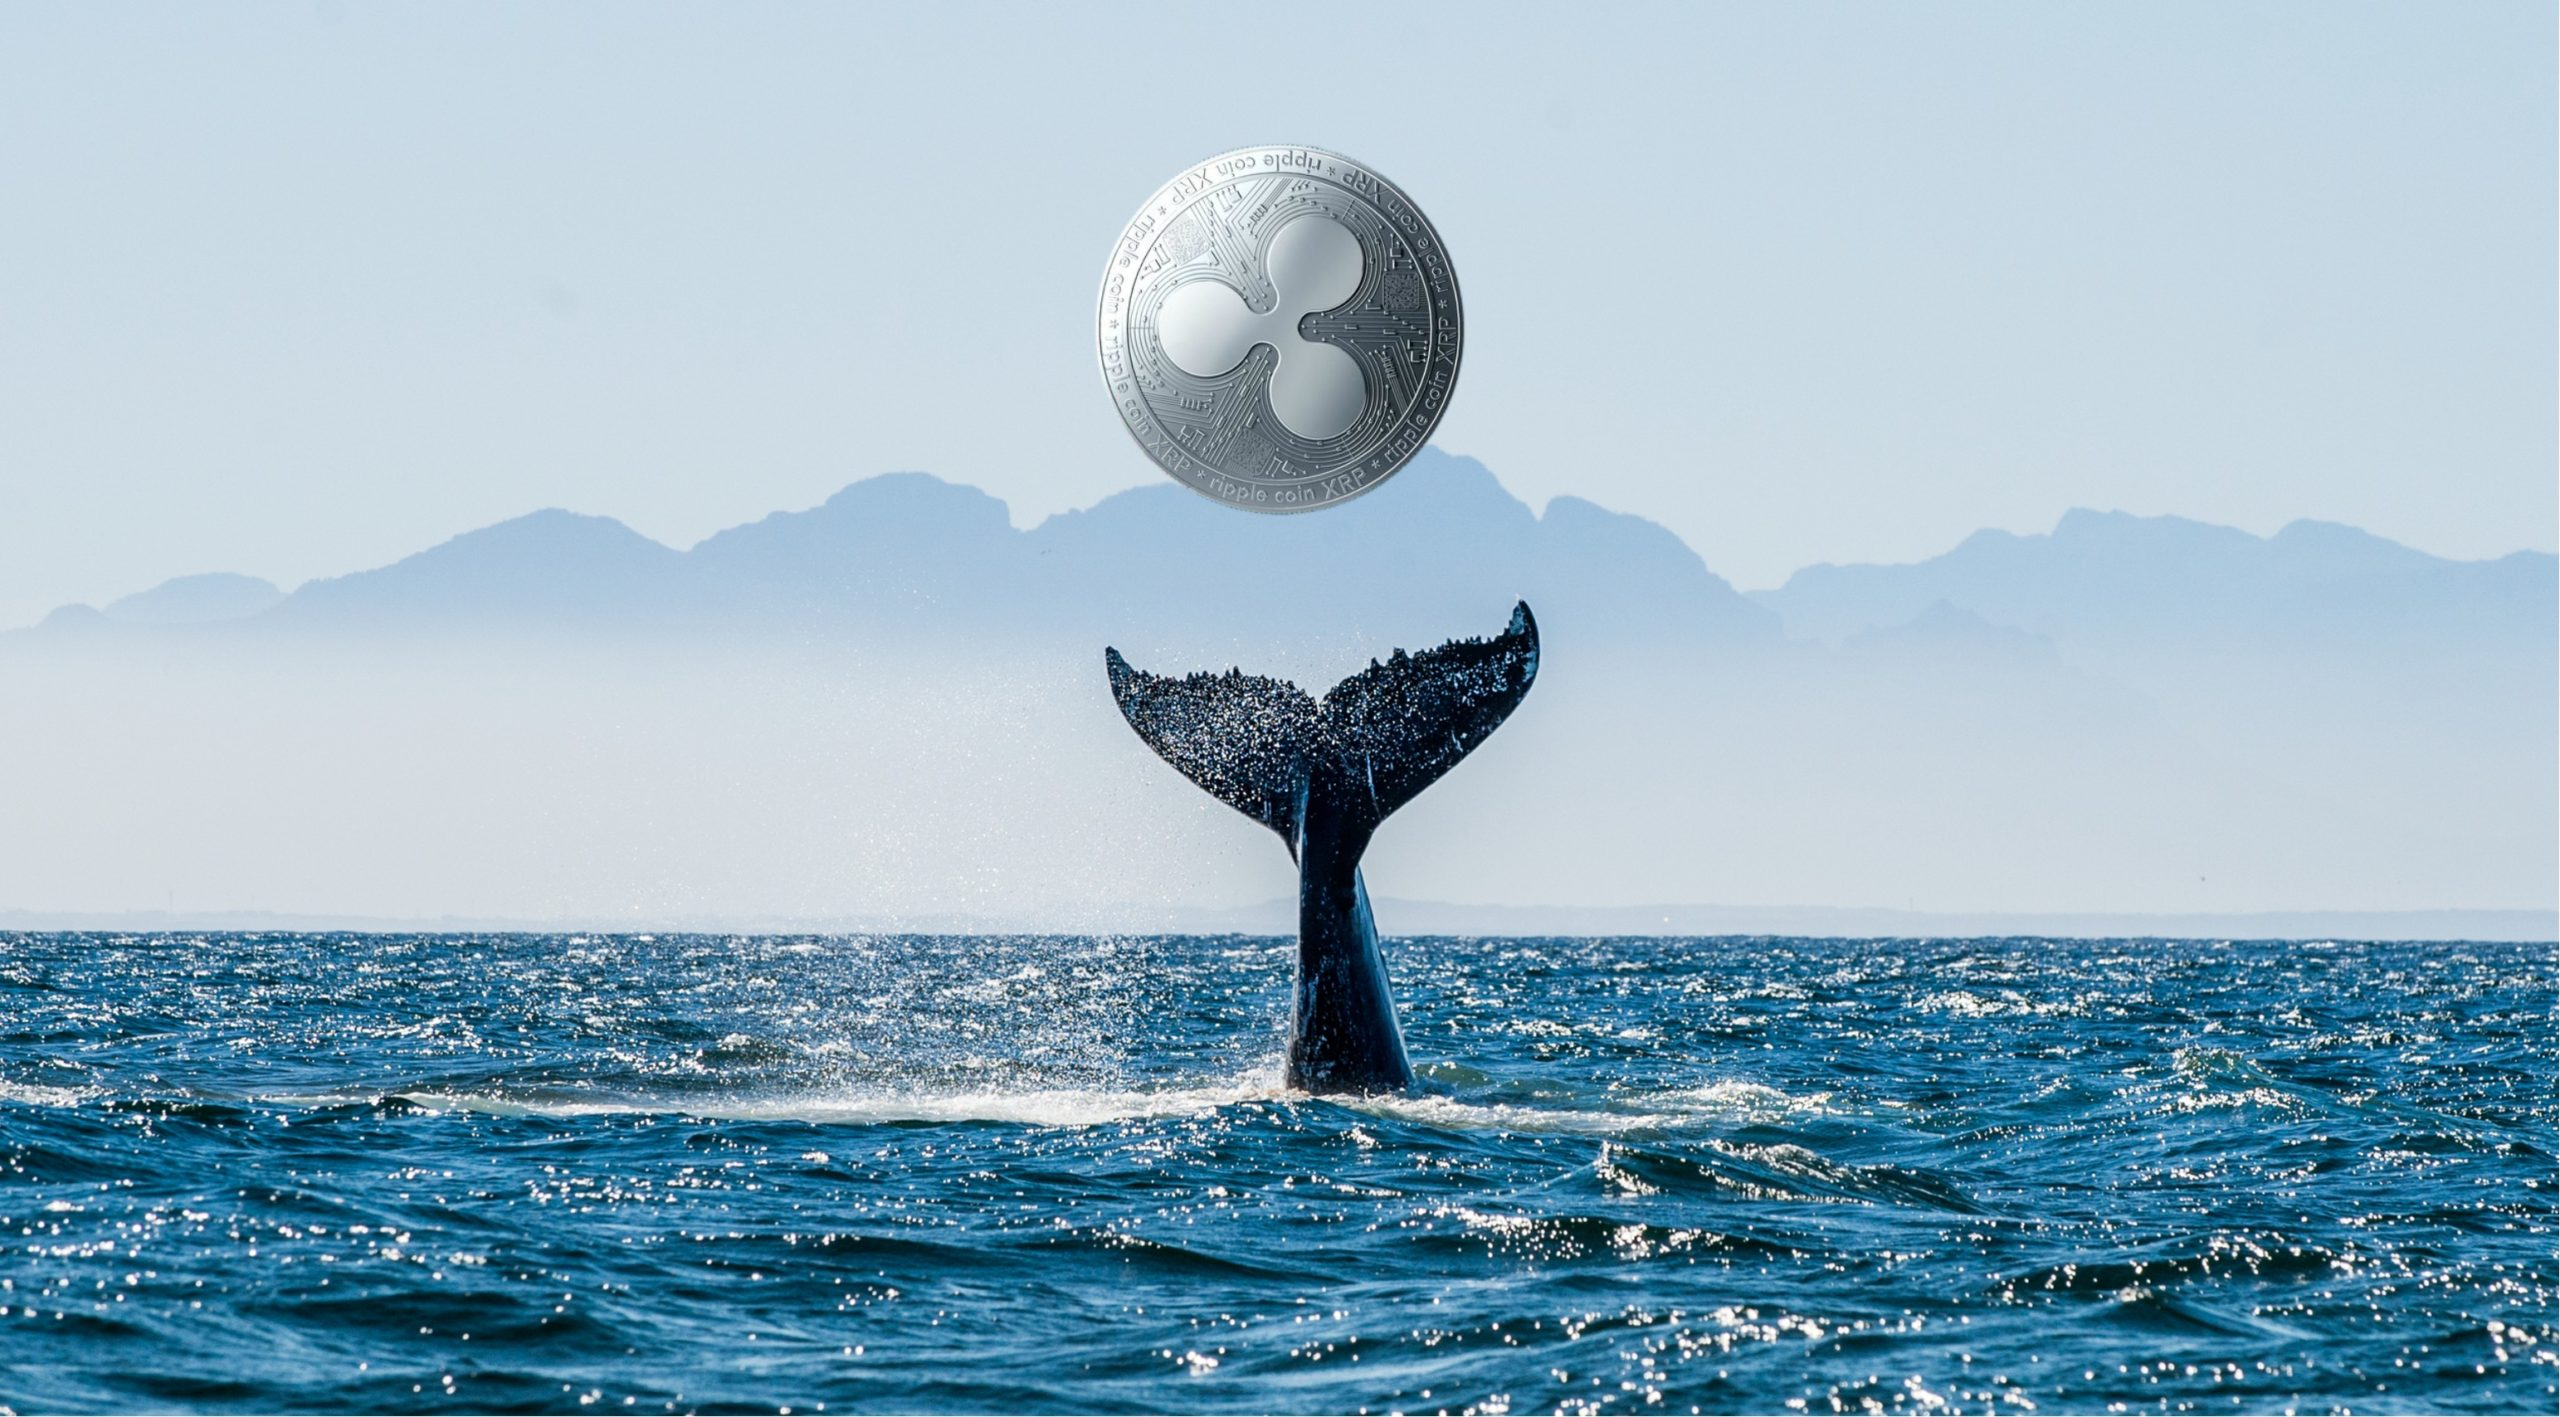 Ripple Balinaları Satış Hazırlığında Devasa XRP Borsalara Transfer Edildi scaled